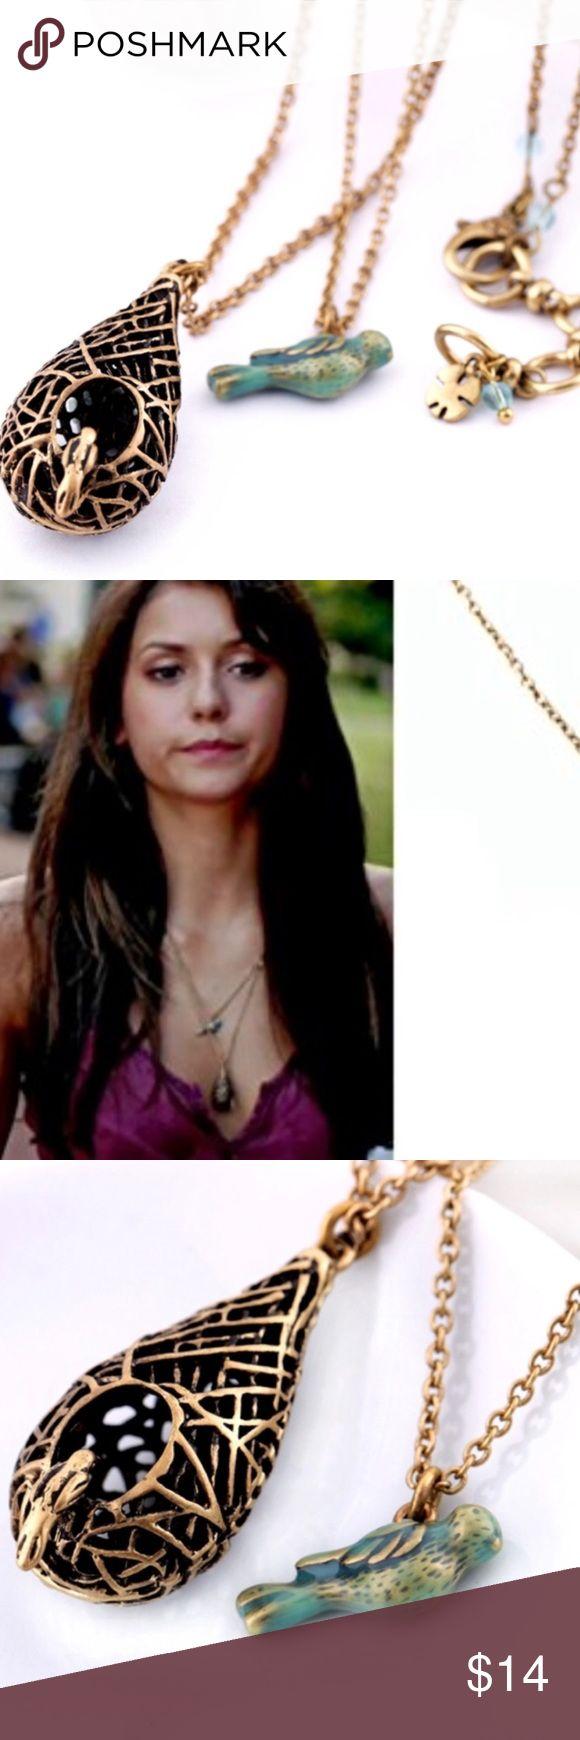 Gorgeous  Nest & Bird Necklace Excellent quality! Beautiful details. Jewelry Necklaces